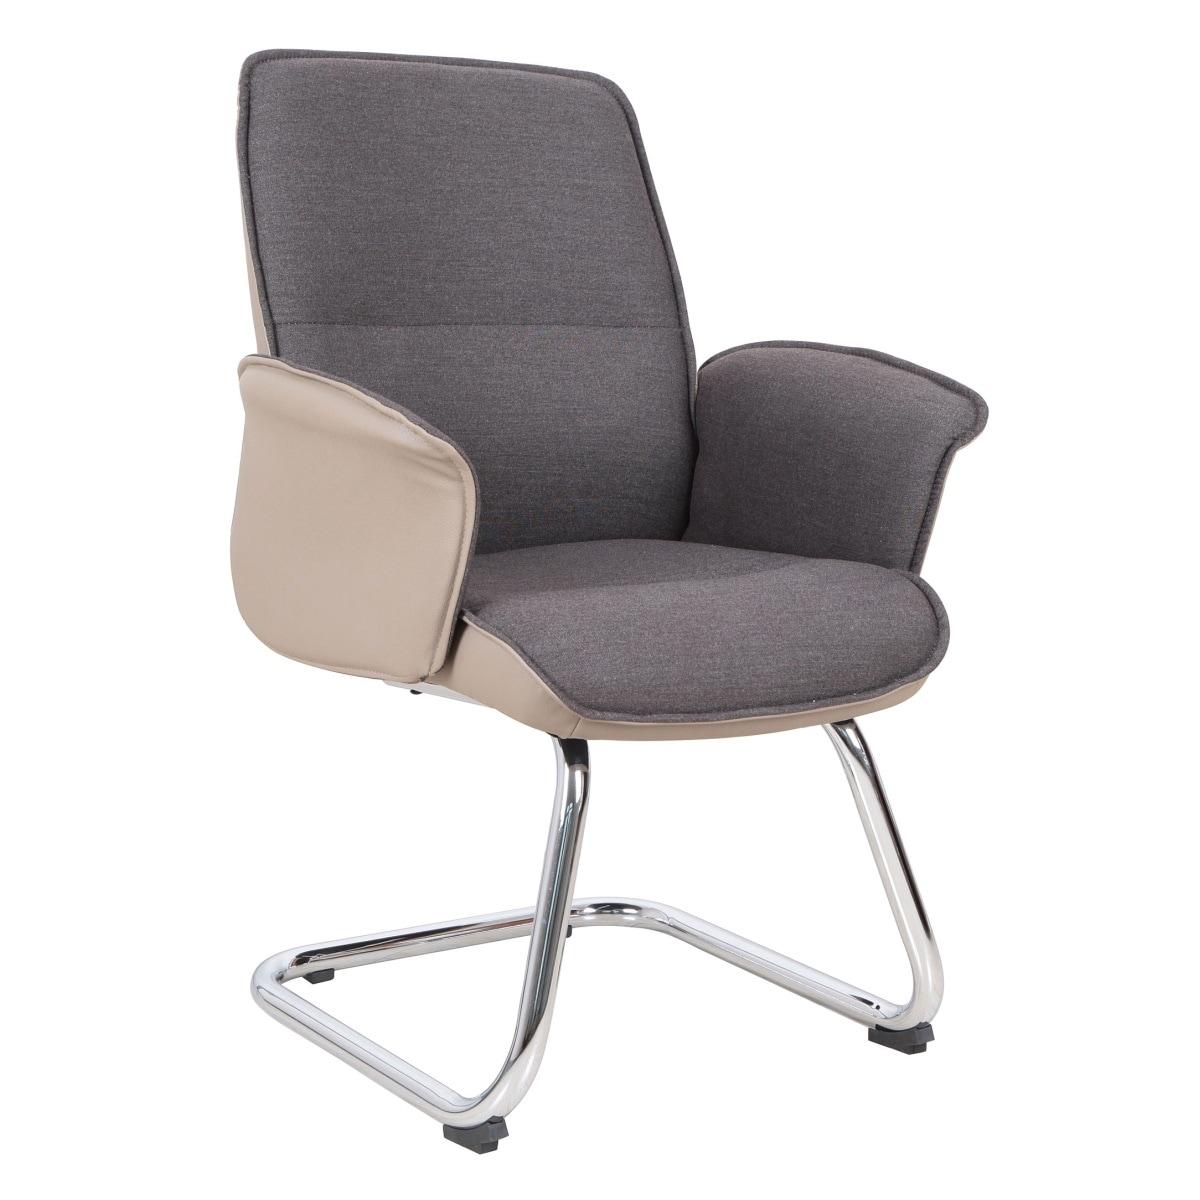 besucherstuhl preston stoffbezug braun ledelrook beige porta. Black Bedroom Furniture Sets. Home Design Ideas